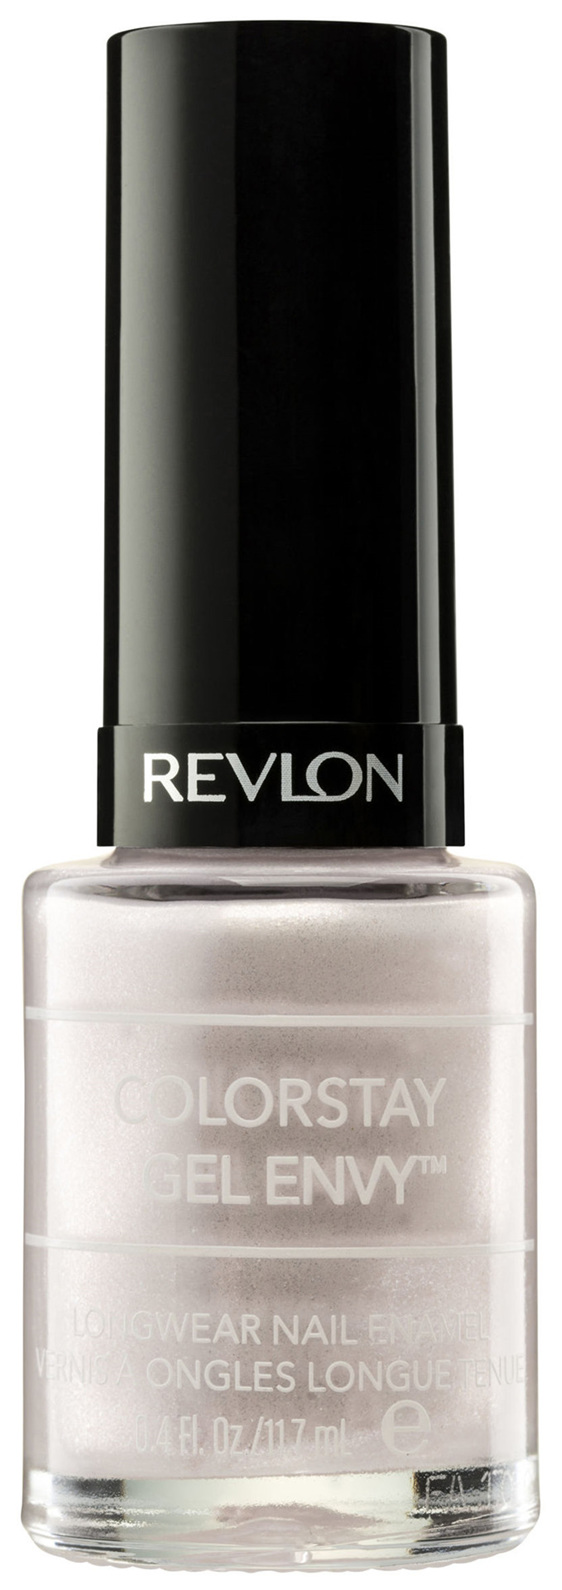 Revlon Colorstay Gel Envy™ Nail Enamel Beginners Luck